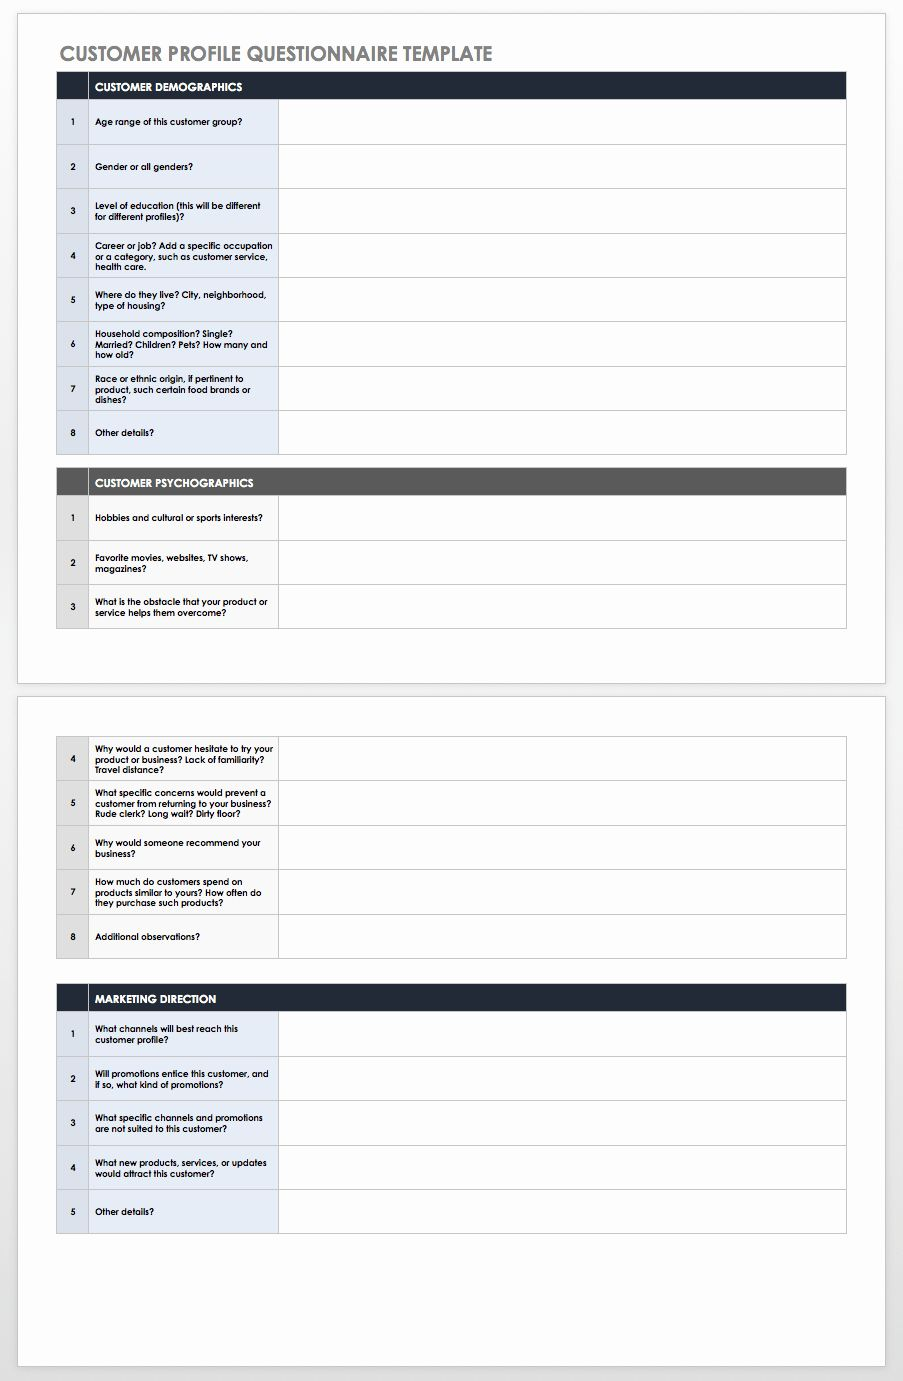 Customer Profile Template Excel Beautiful Free Customer